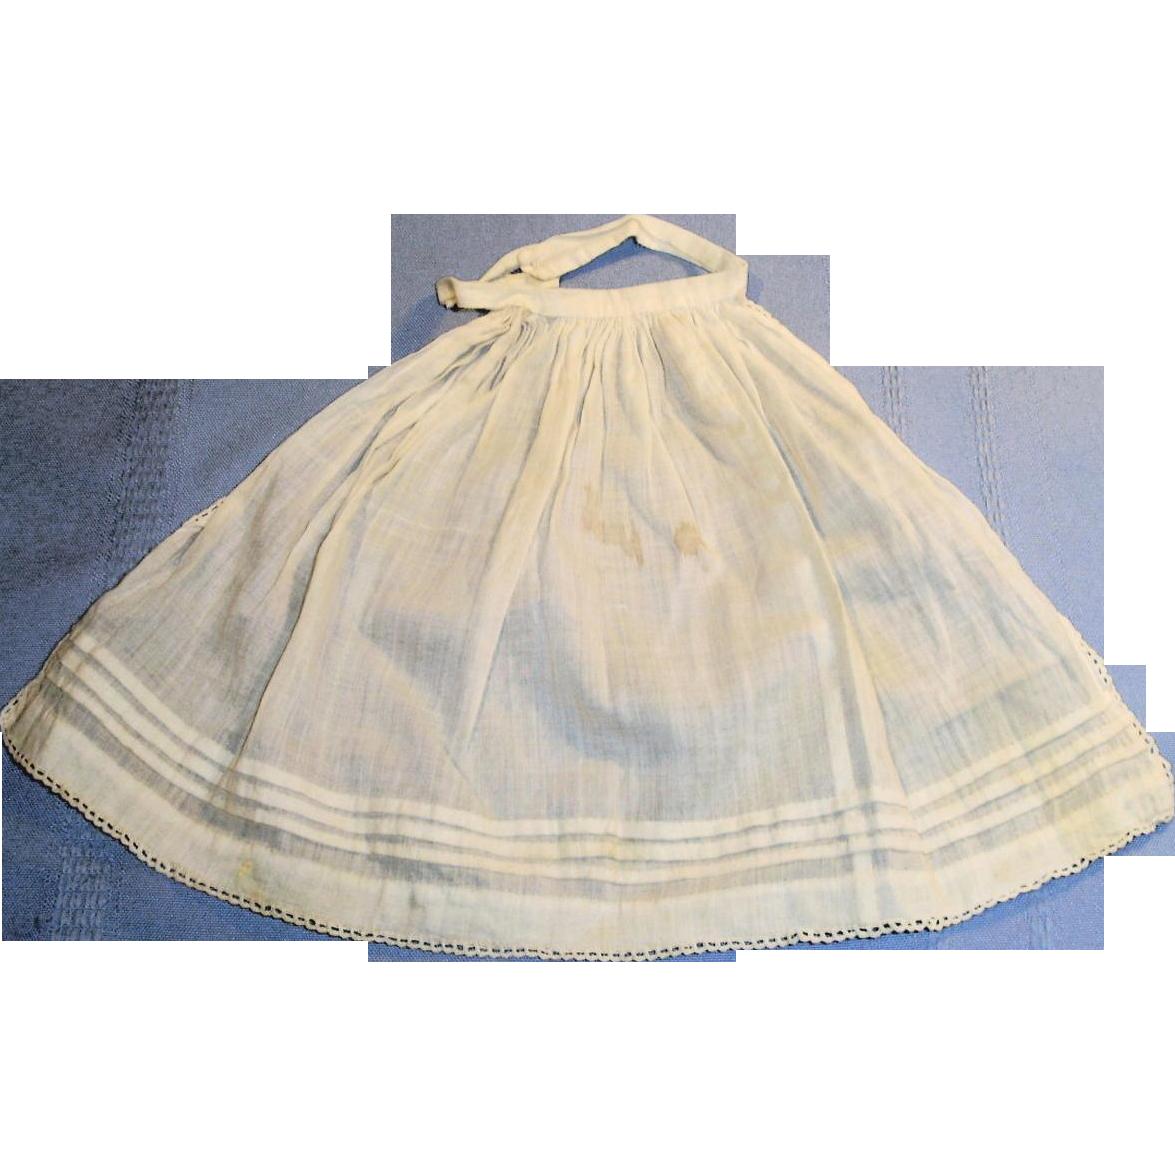 White apron lace trim - Antique White Cotton And Lace Trim Fashion Doll Apron